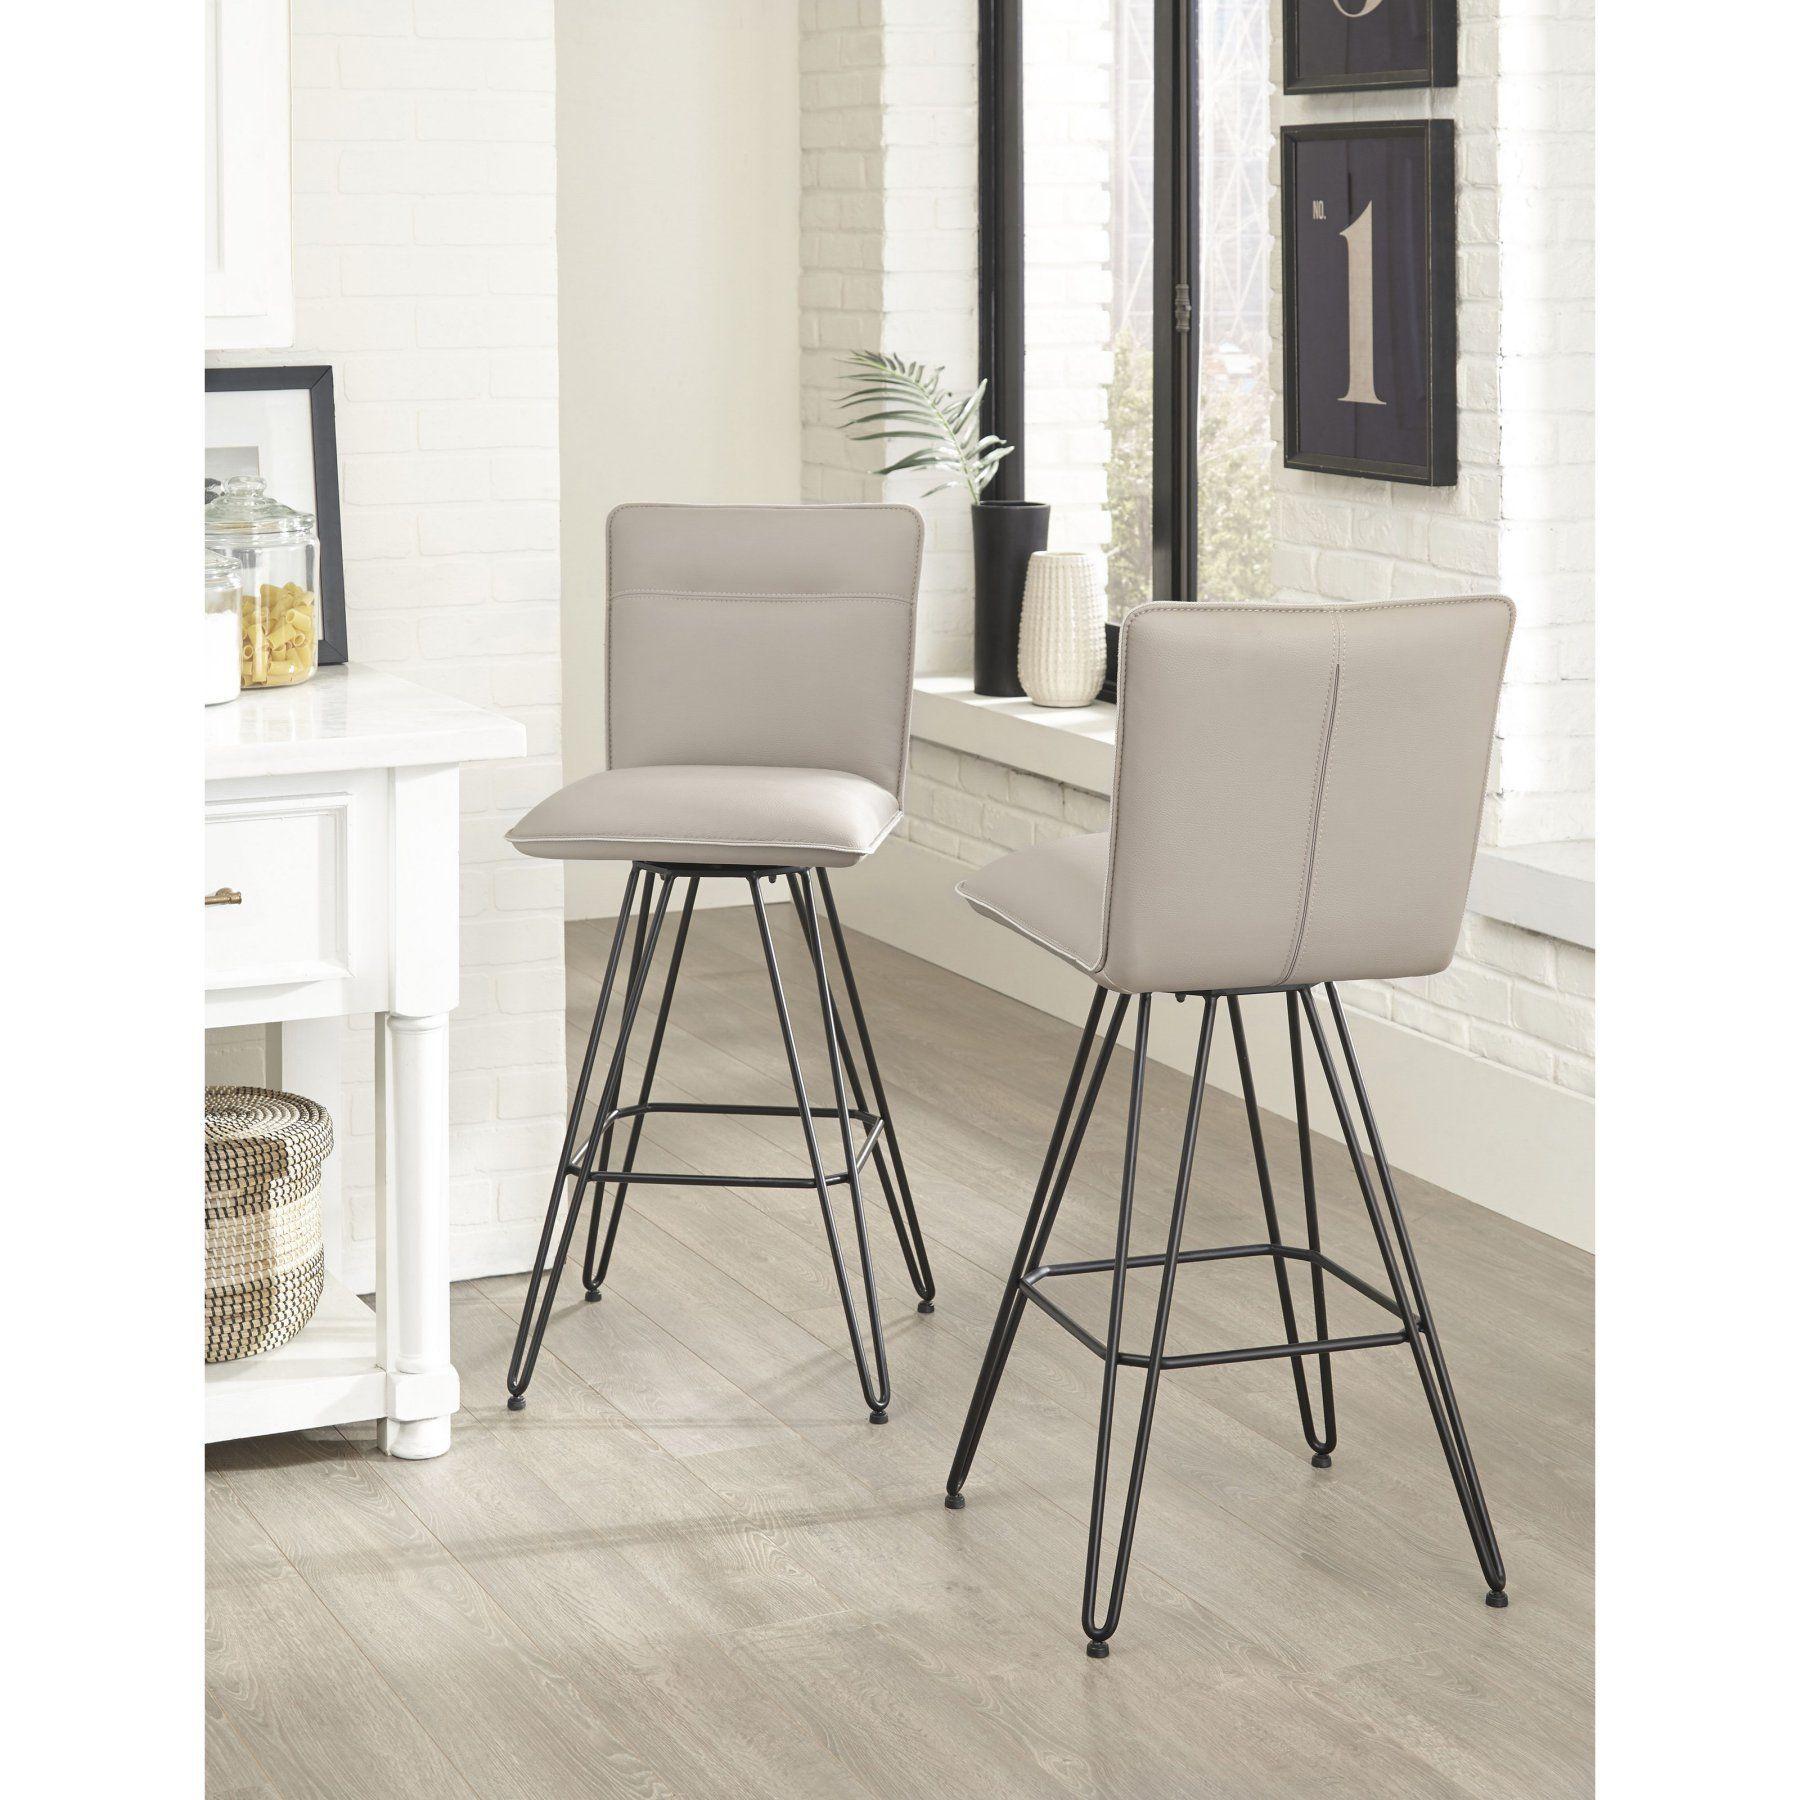 Outstanding Modus Demi Hairpin Leg Swivel Bar Stool Set Of 2 Mod1097 Unemploymentrelief Wooden Chair Designs For Living Room Unemploymentrelieforg